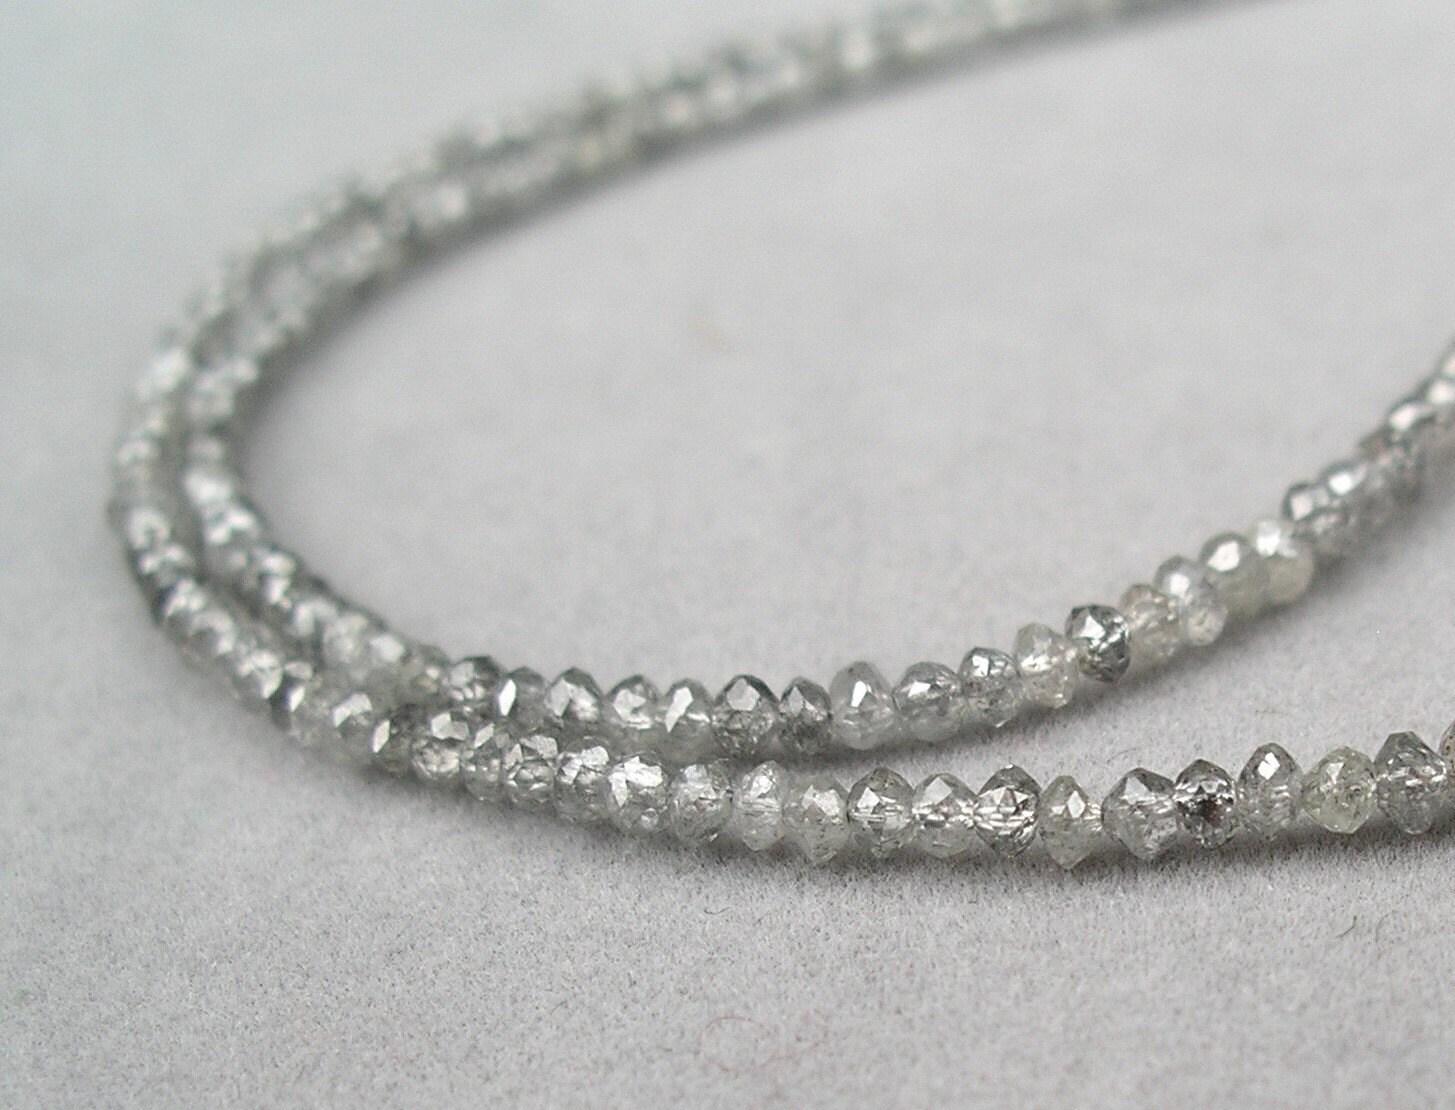 Diamond Bead Necklace